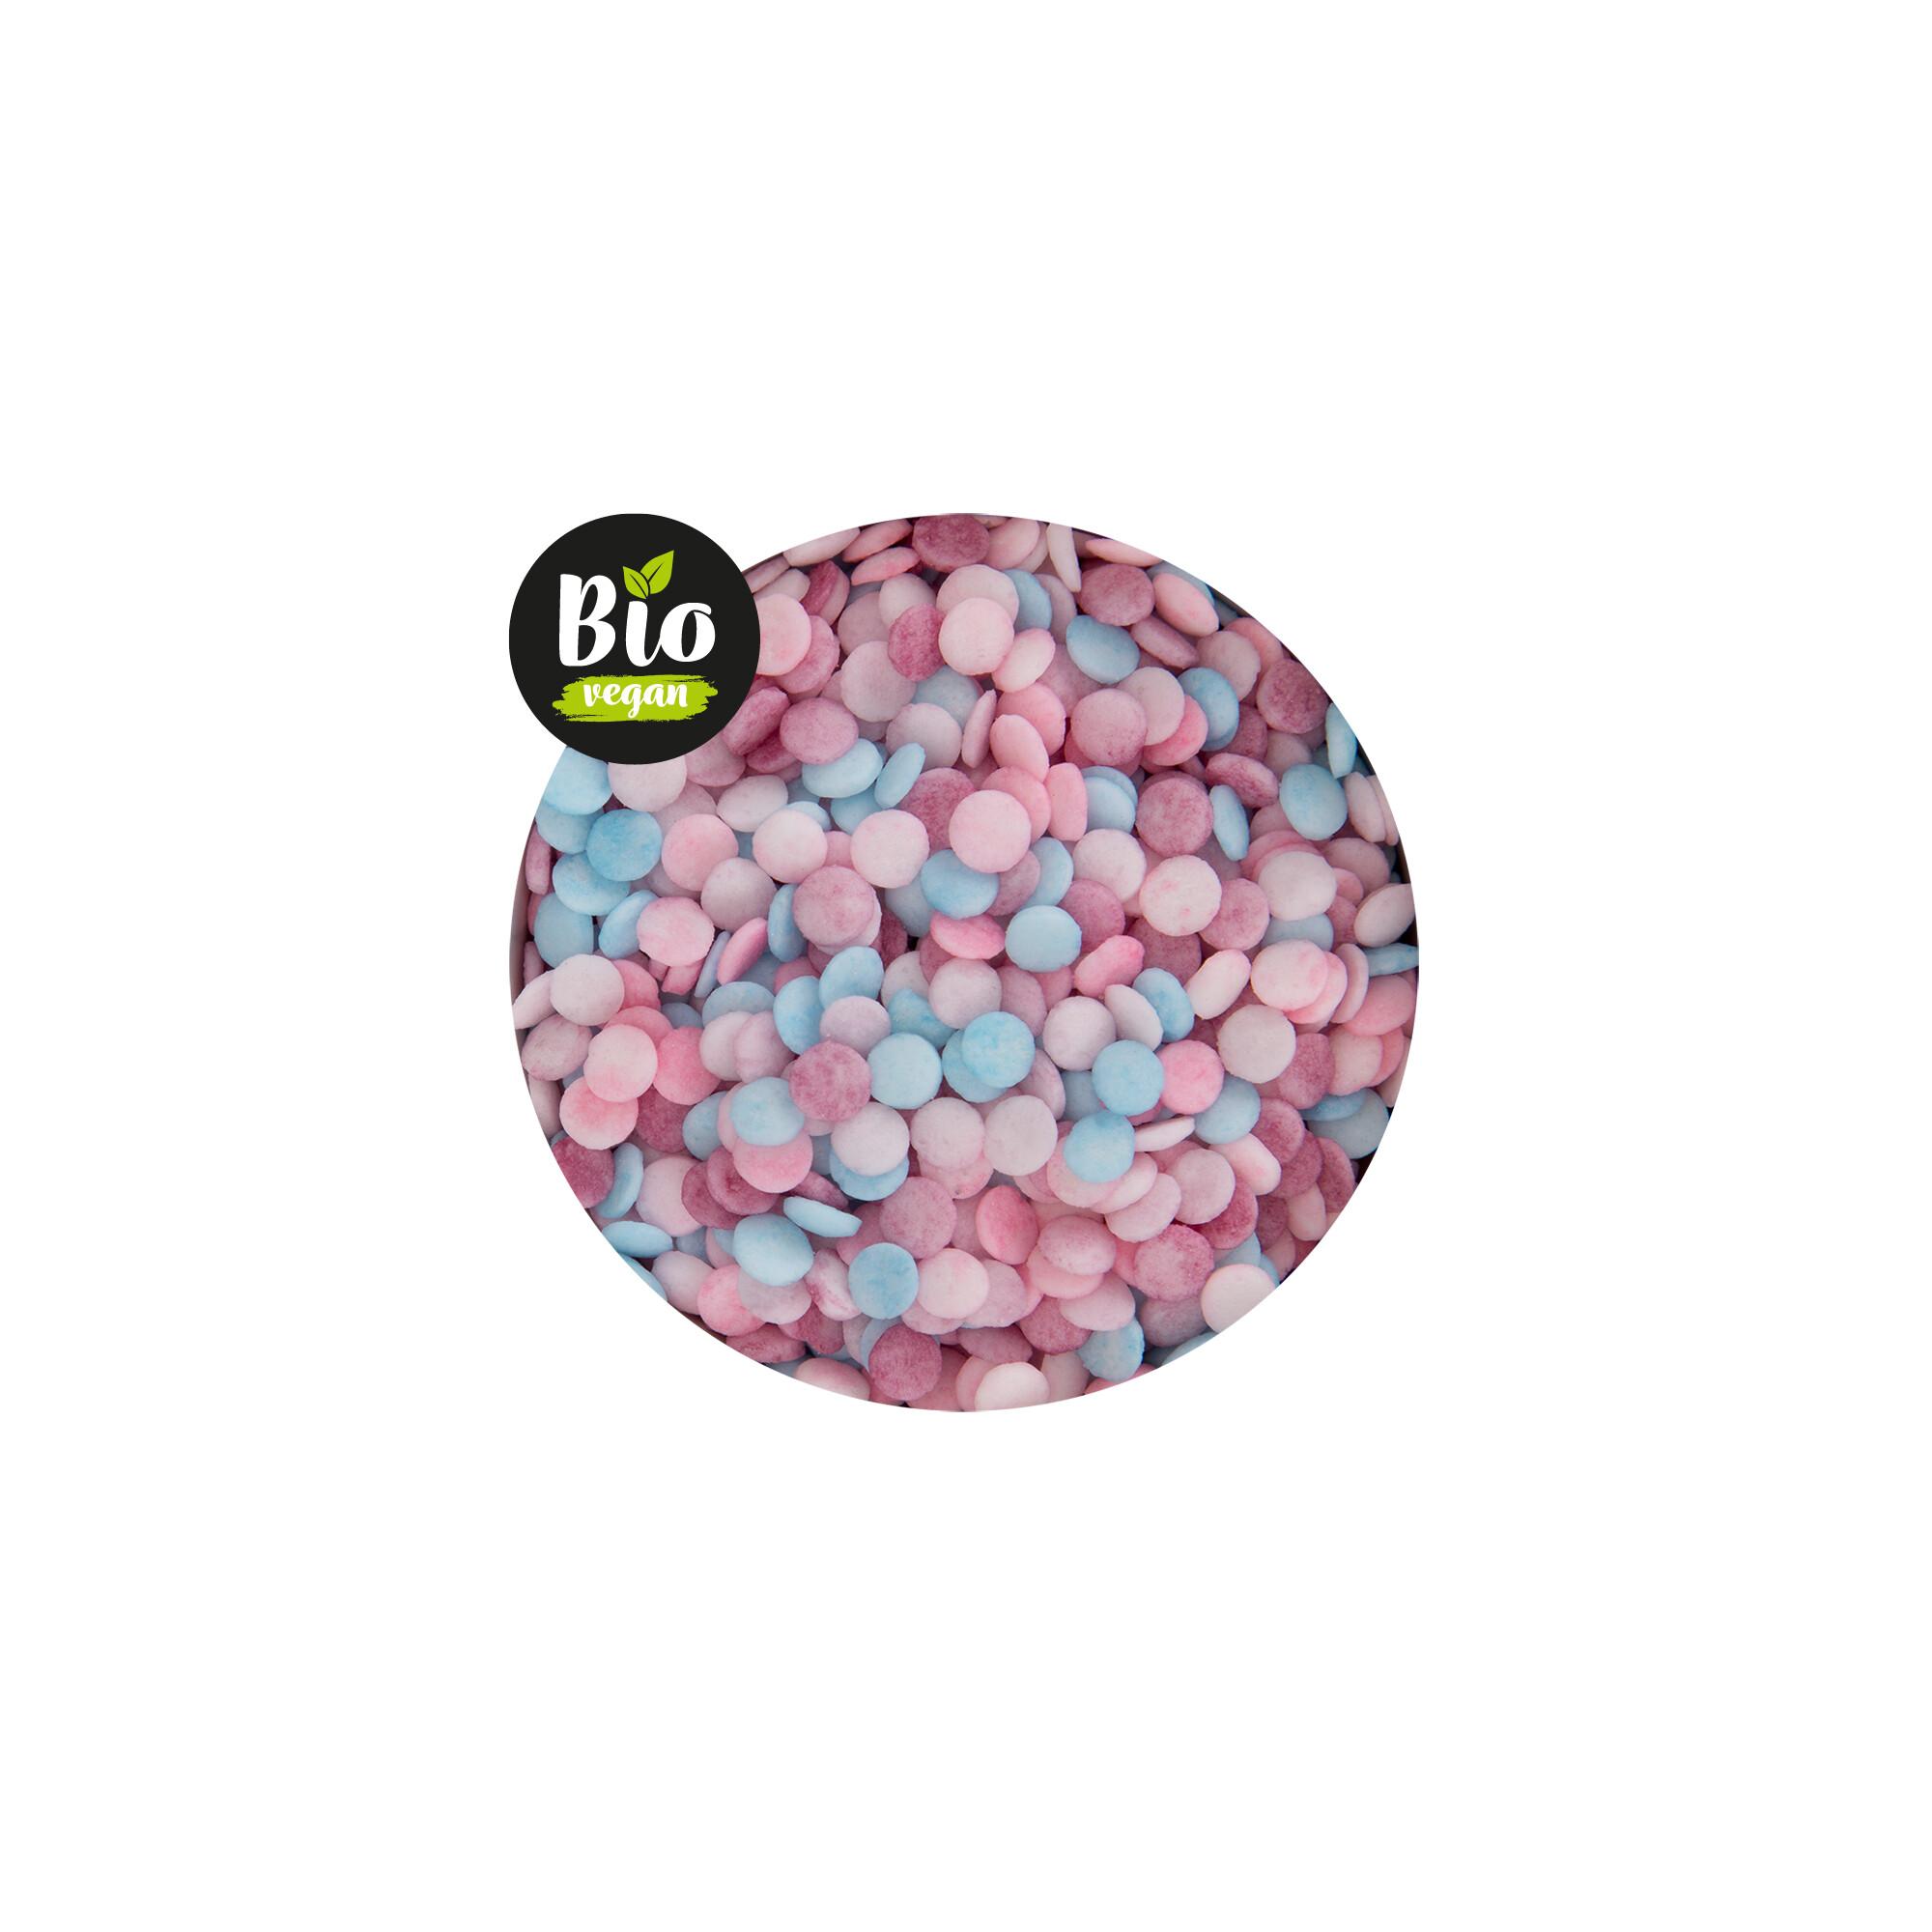 Edible sprinkle decoration - Organic Confetti